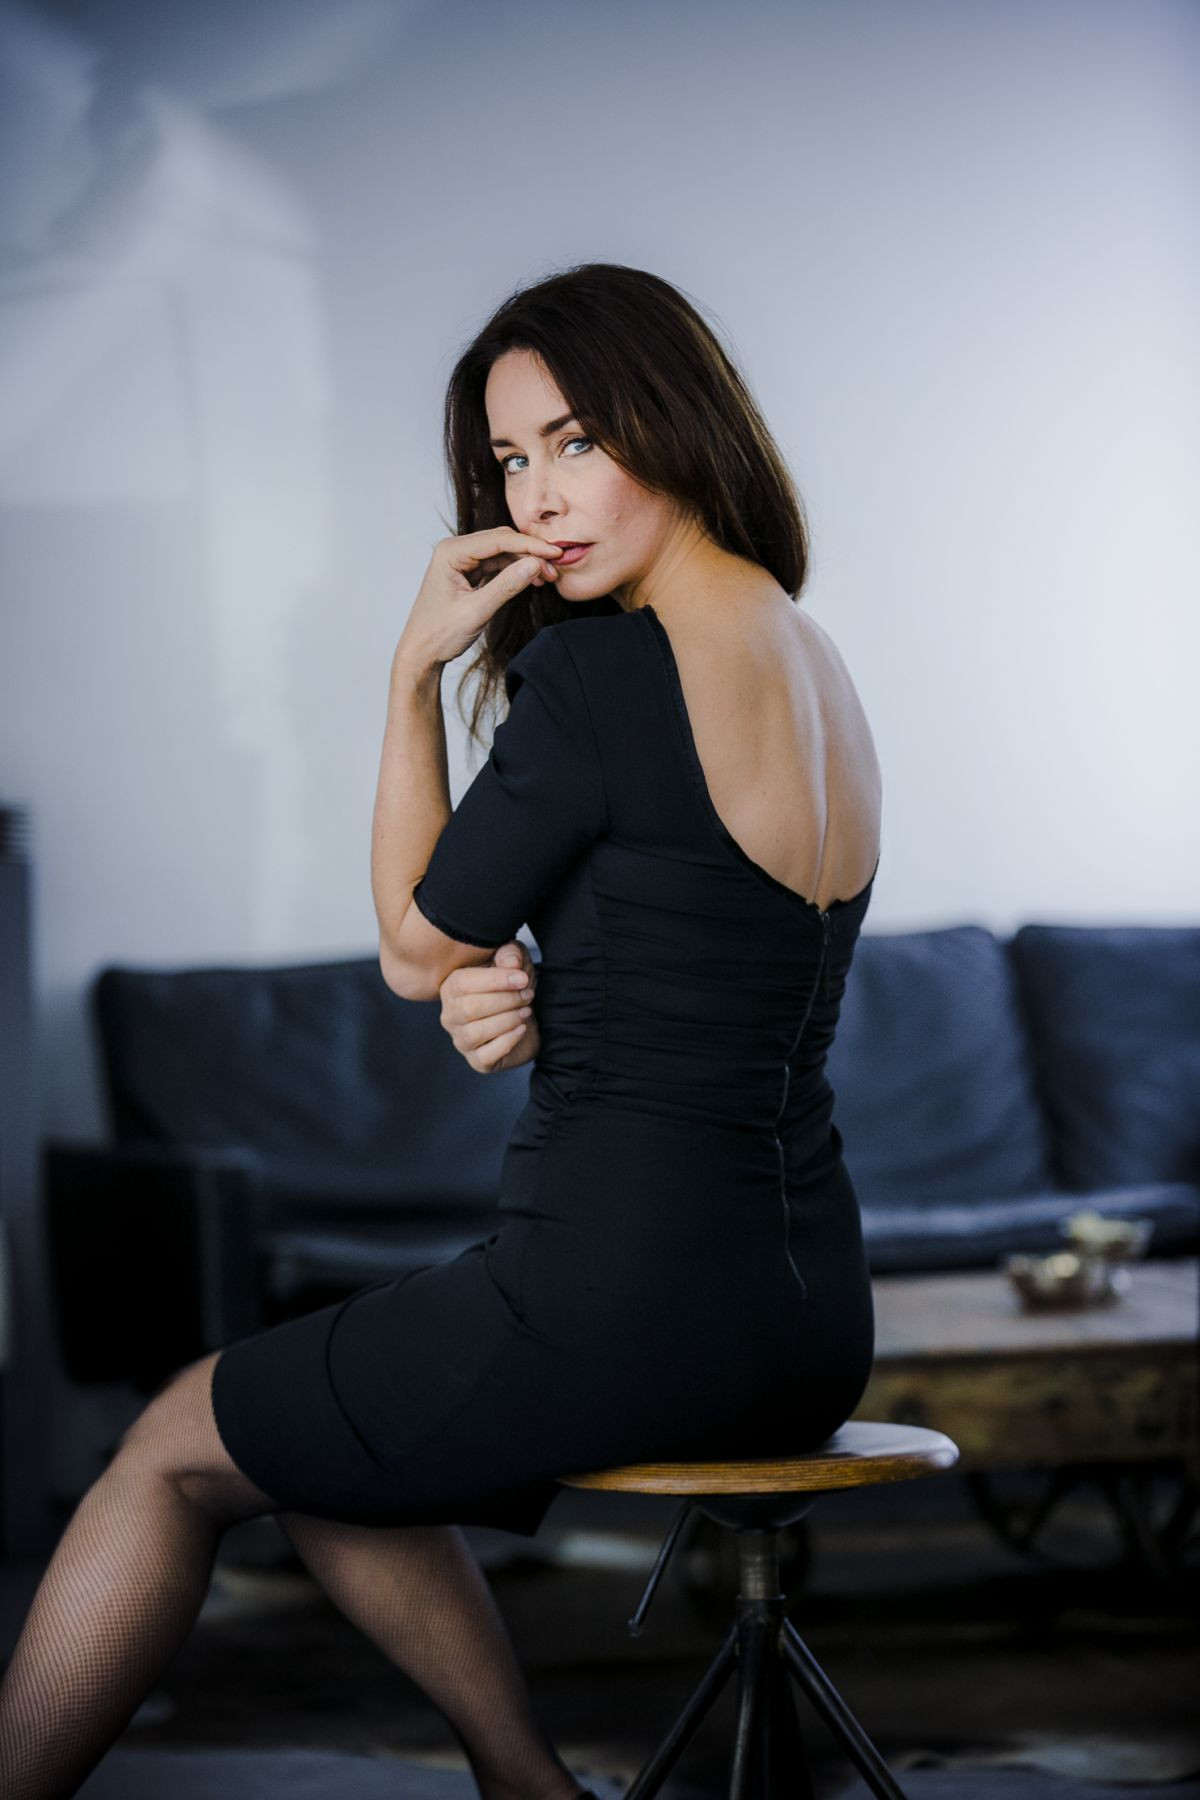 Katharina mueller elmau nackt